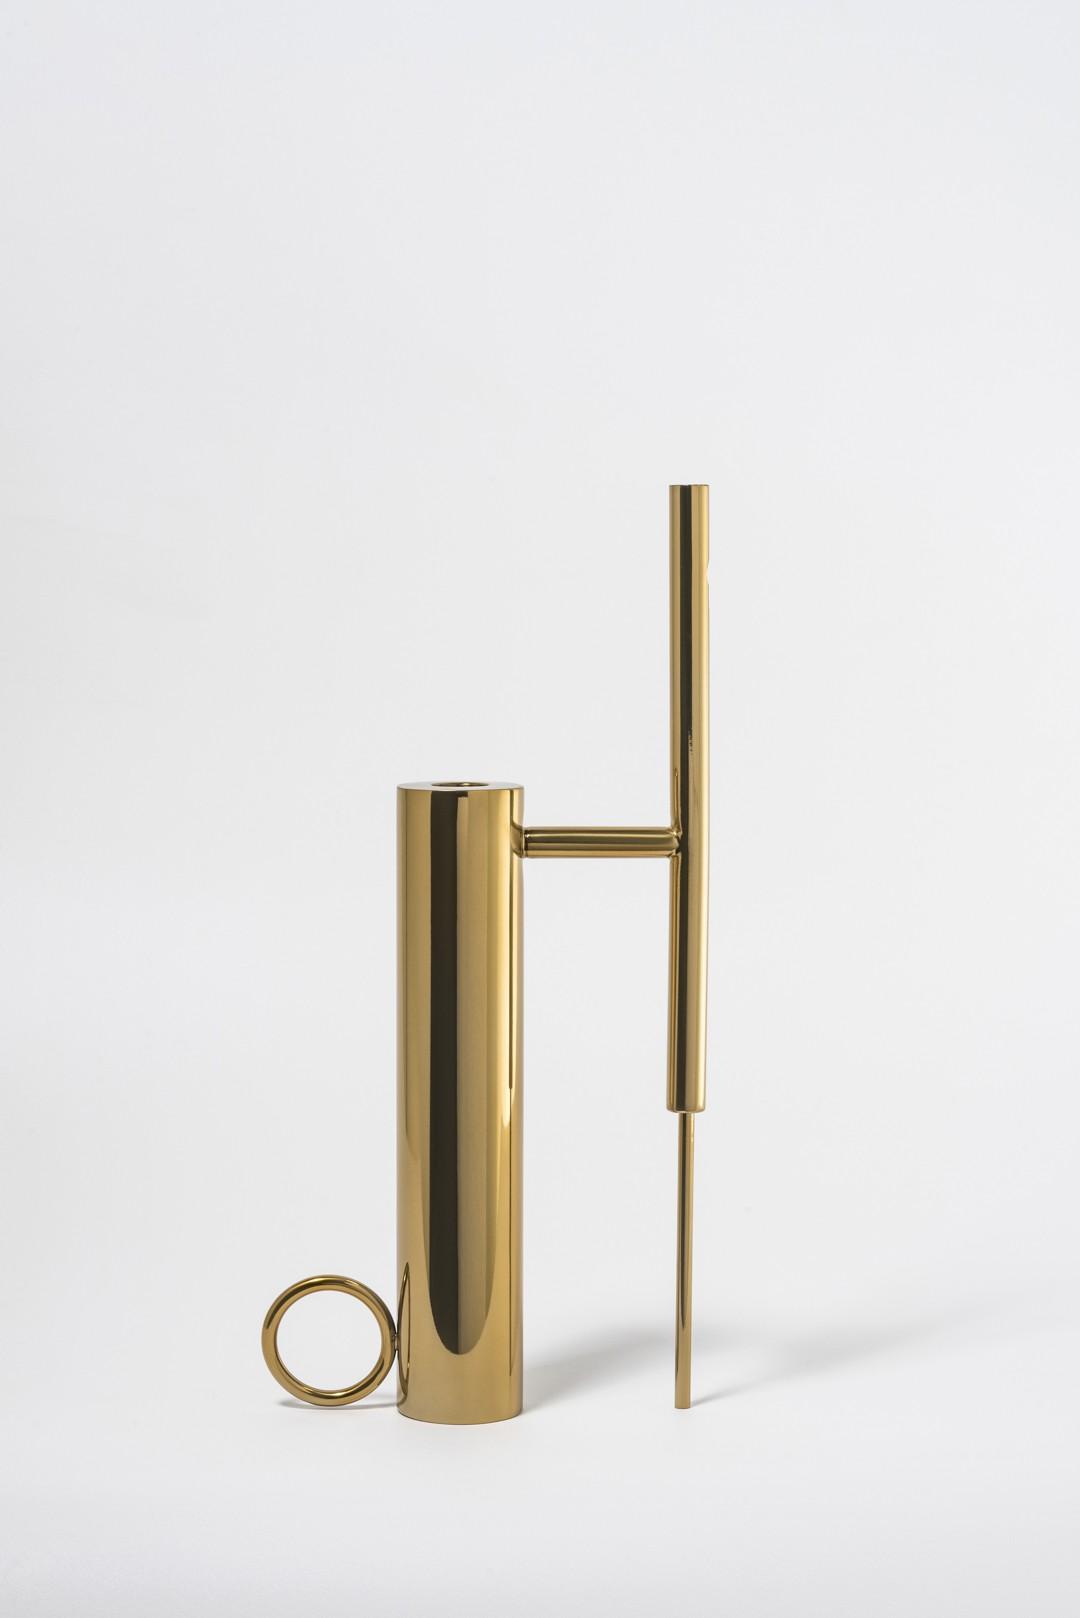 Castiçal-Vaso Oh, Gio | dourado